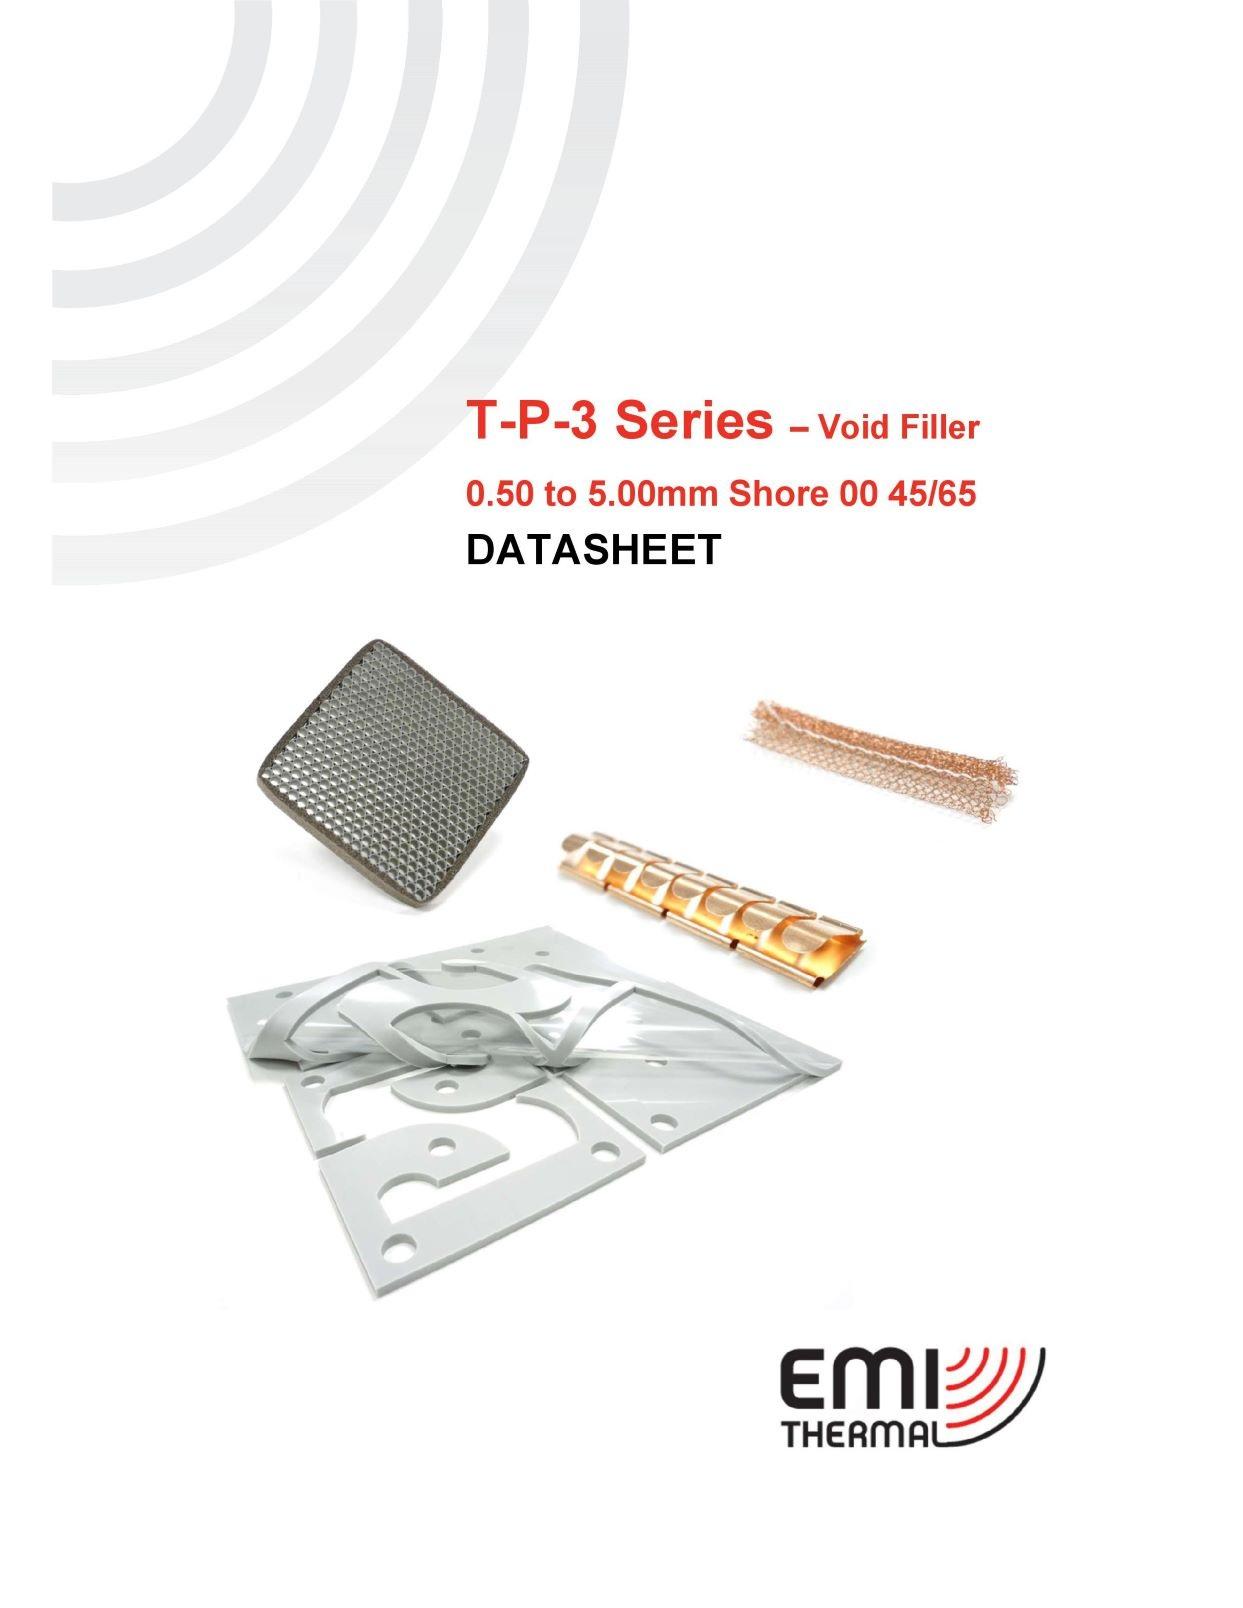 T-P-3+Series.jpg